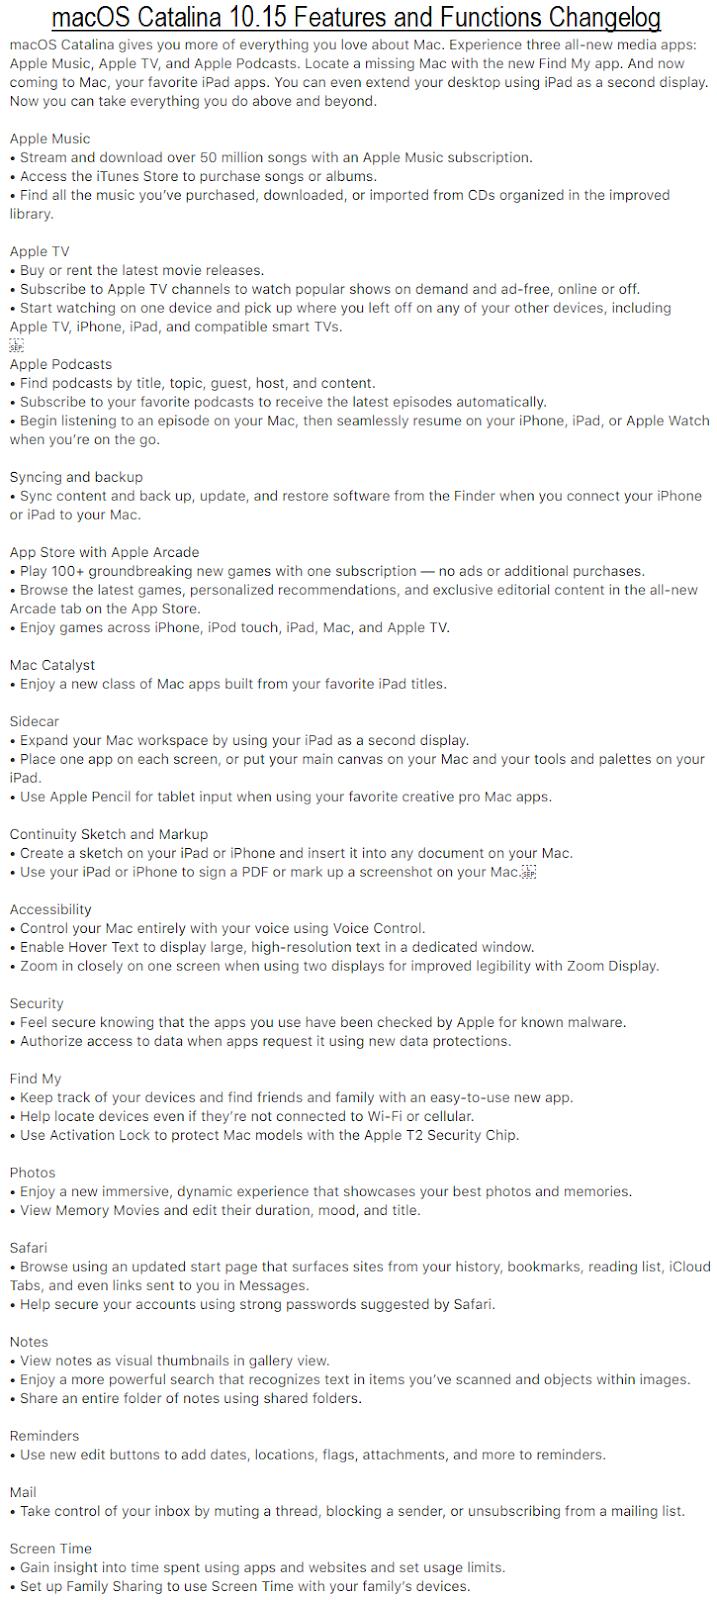 macOS 10.15 Catalina Changelog